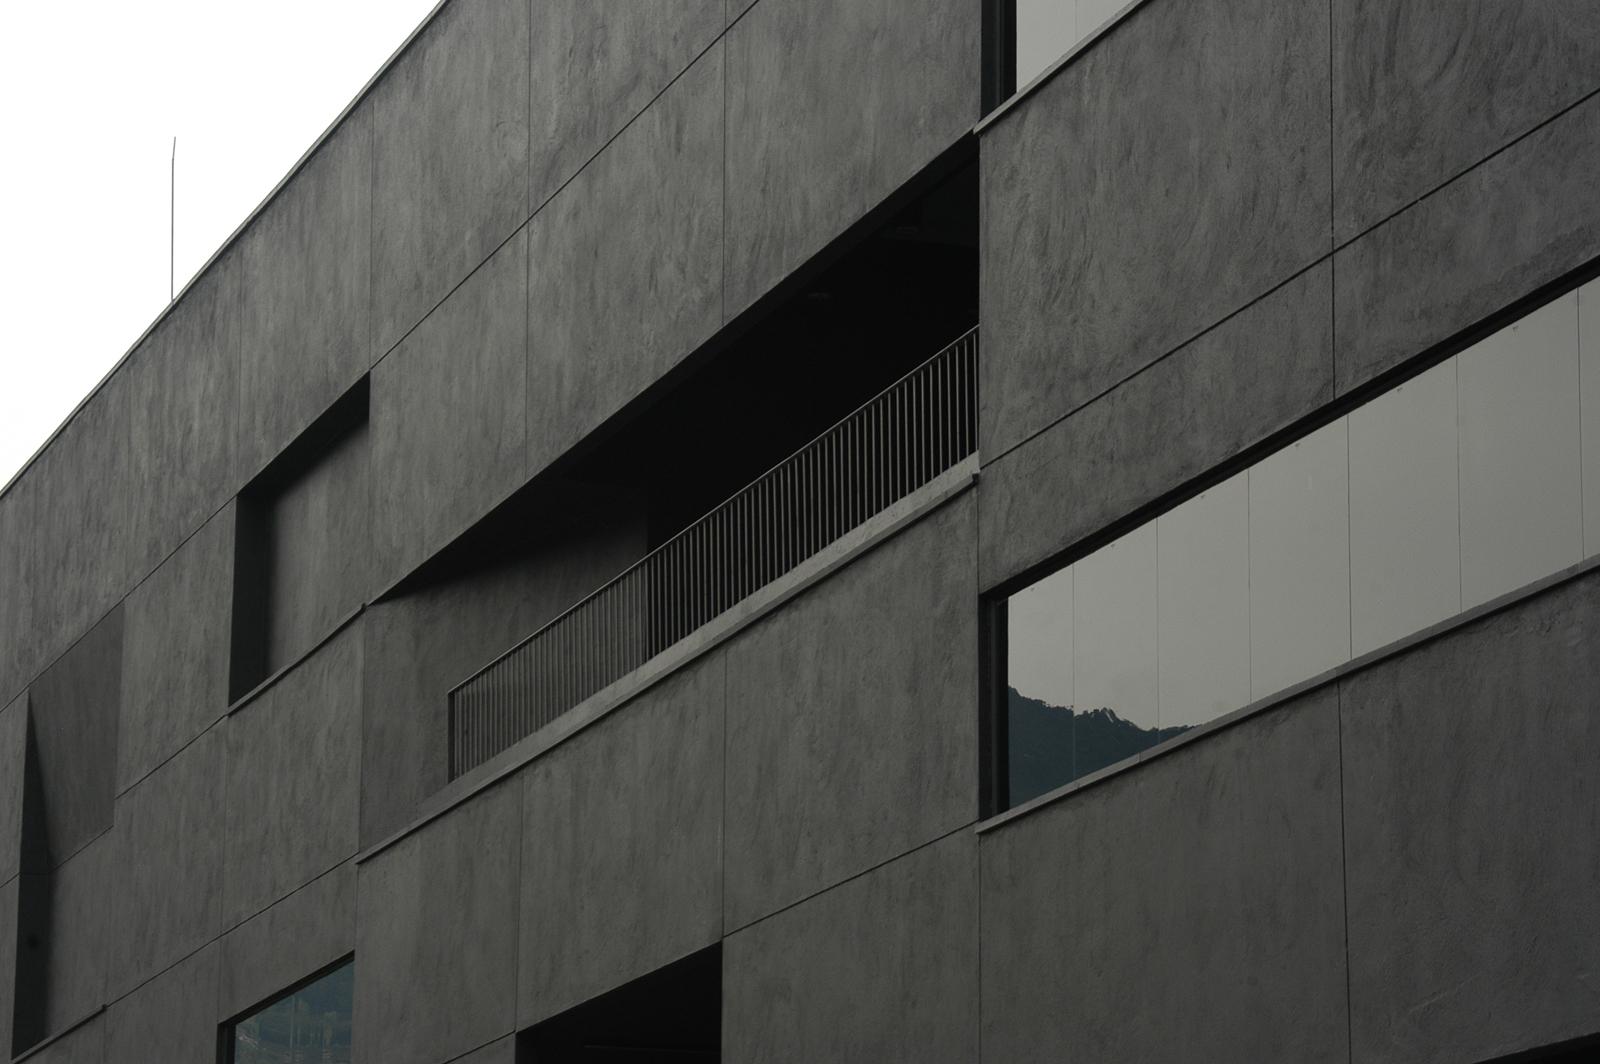 galeria de parque biblioteca fernando botero g ateliers architecture 25. Black Bedroom Furniture Sets. Home Design Ideas